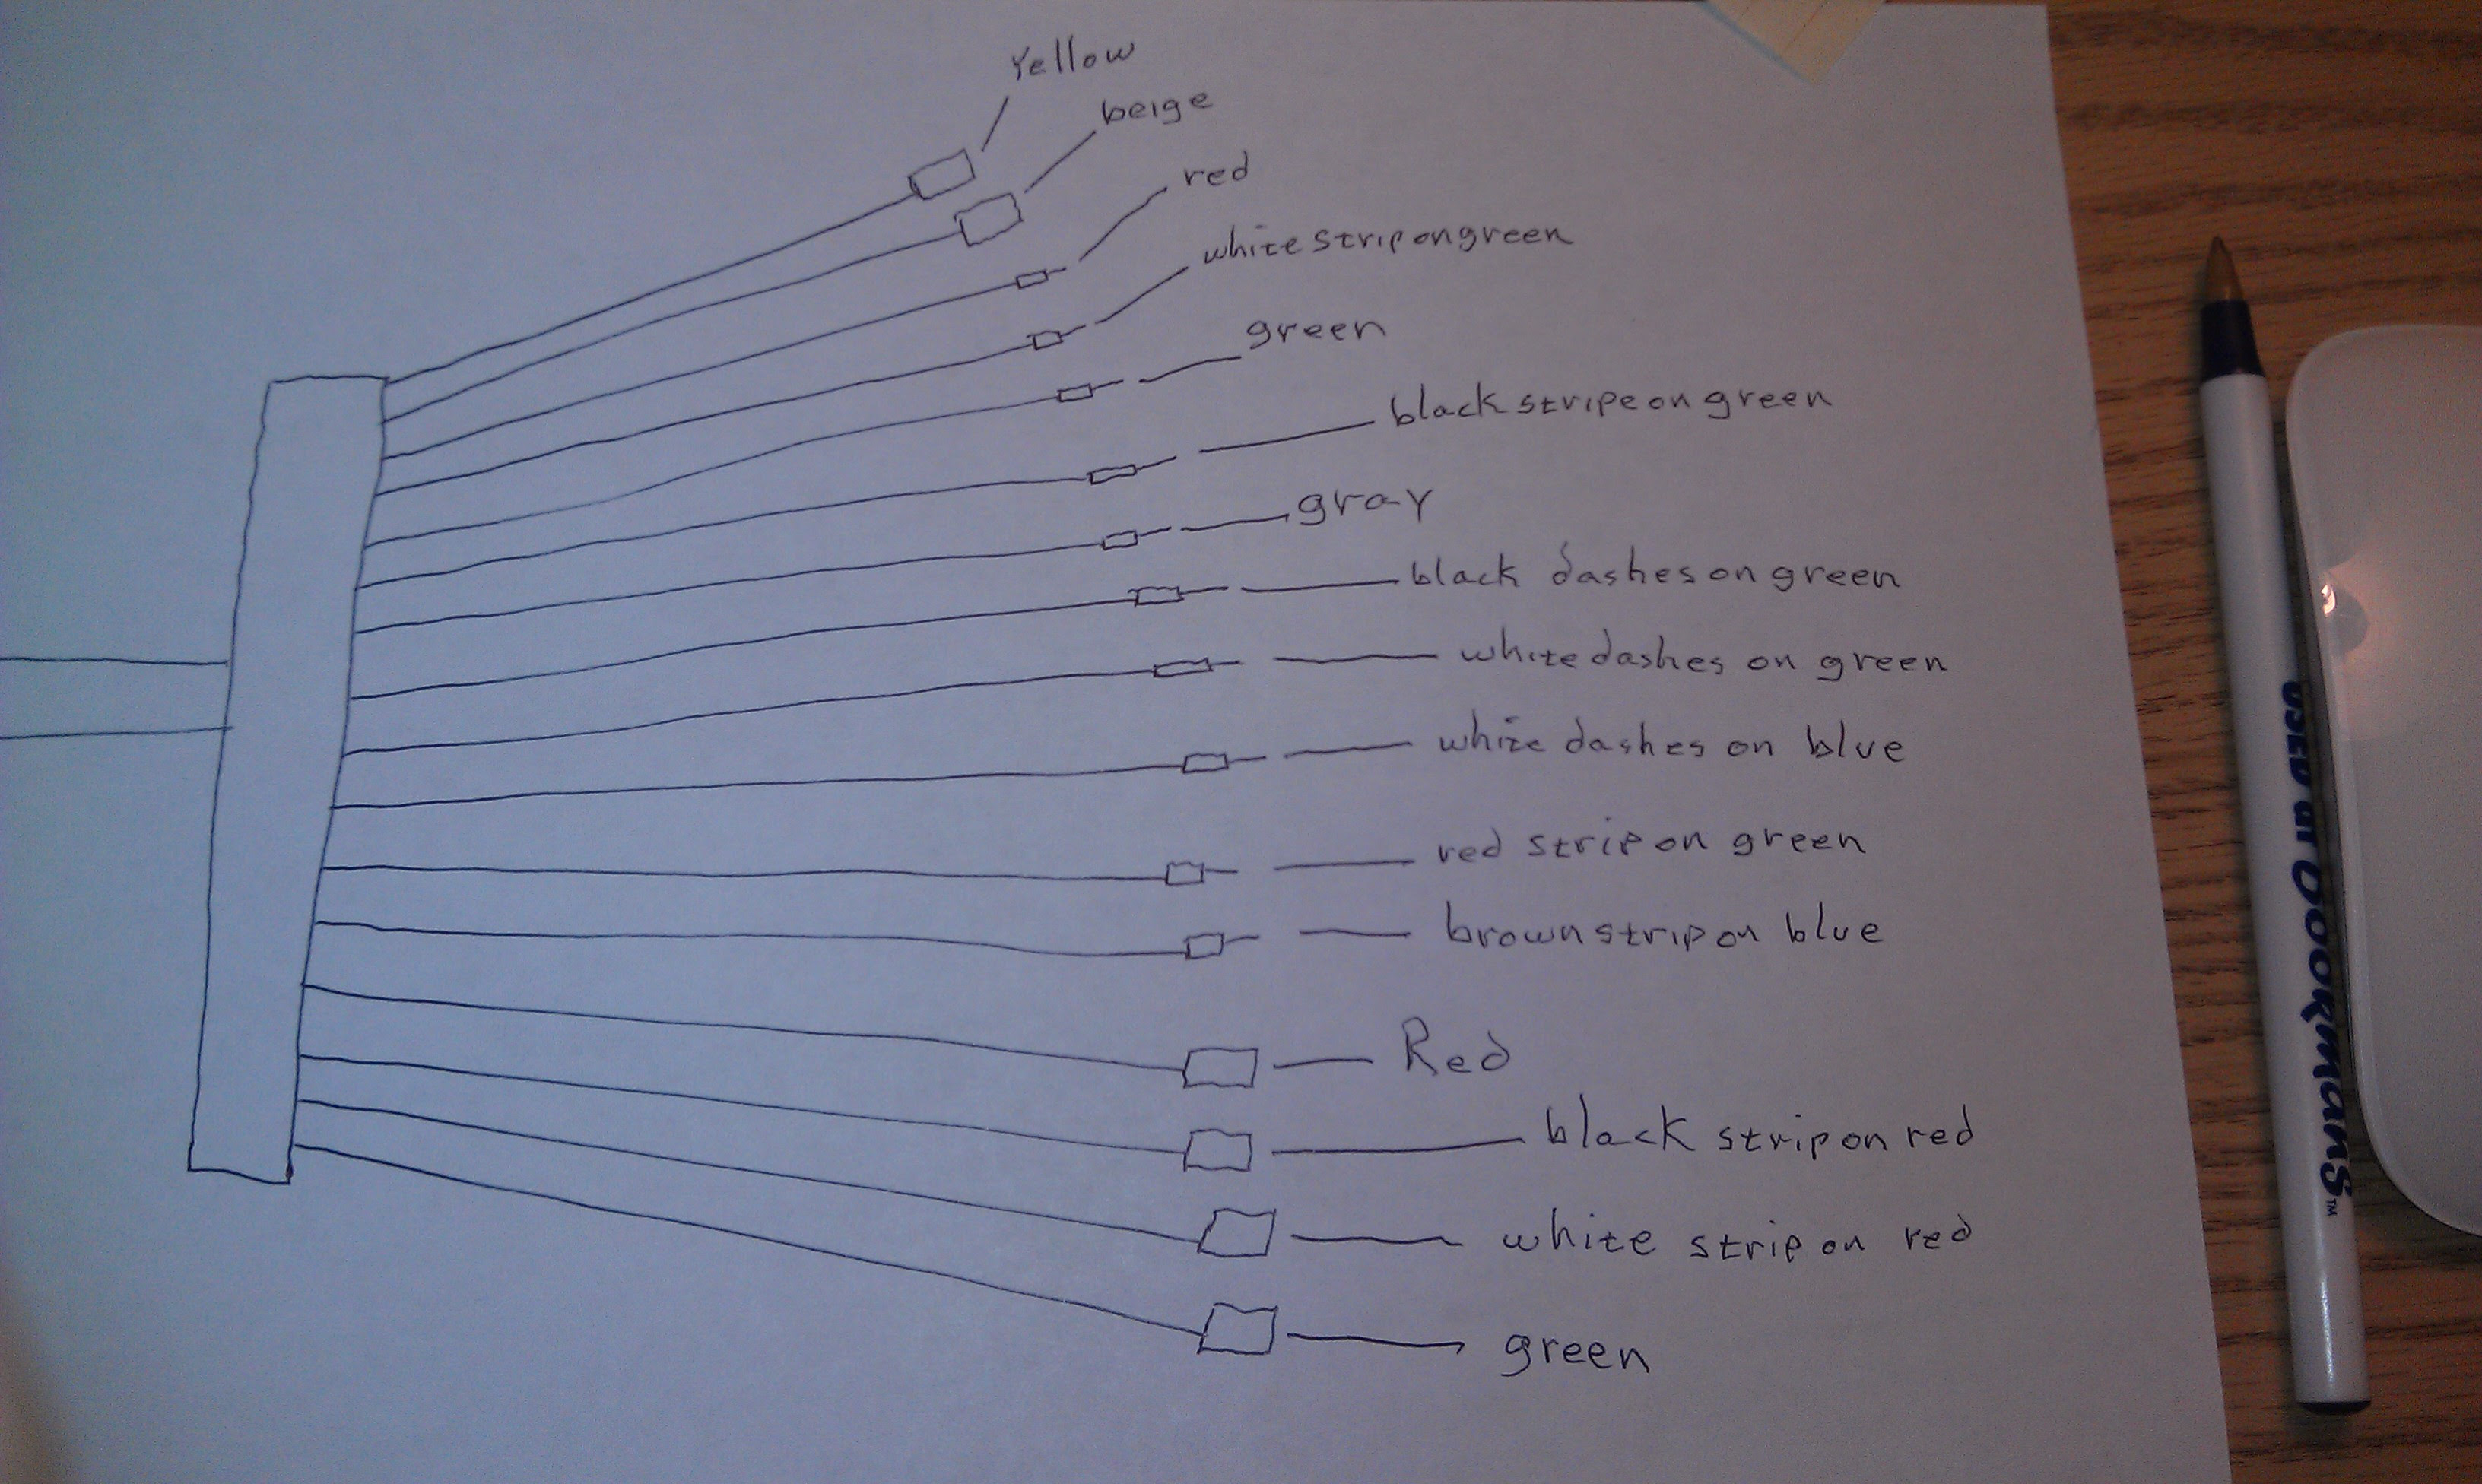 13eba59 Magentis 2008 Fuse Box Diagram Wiring Library